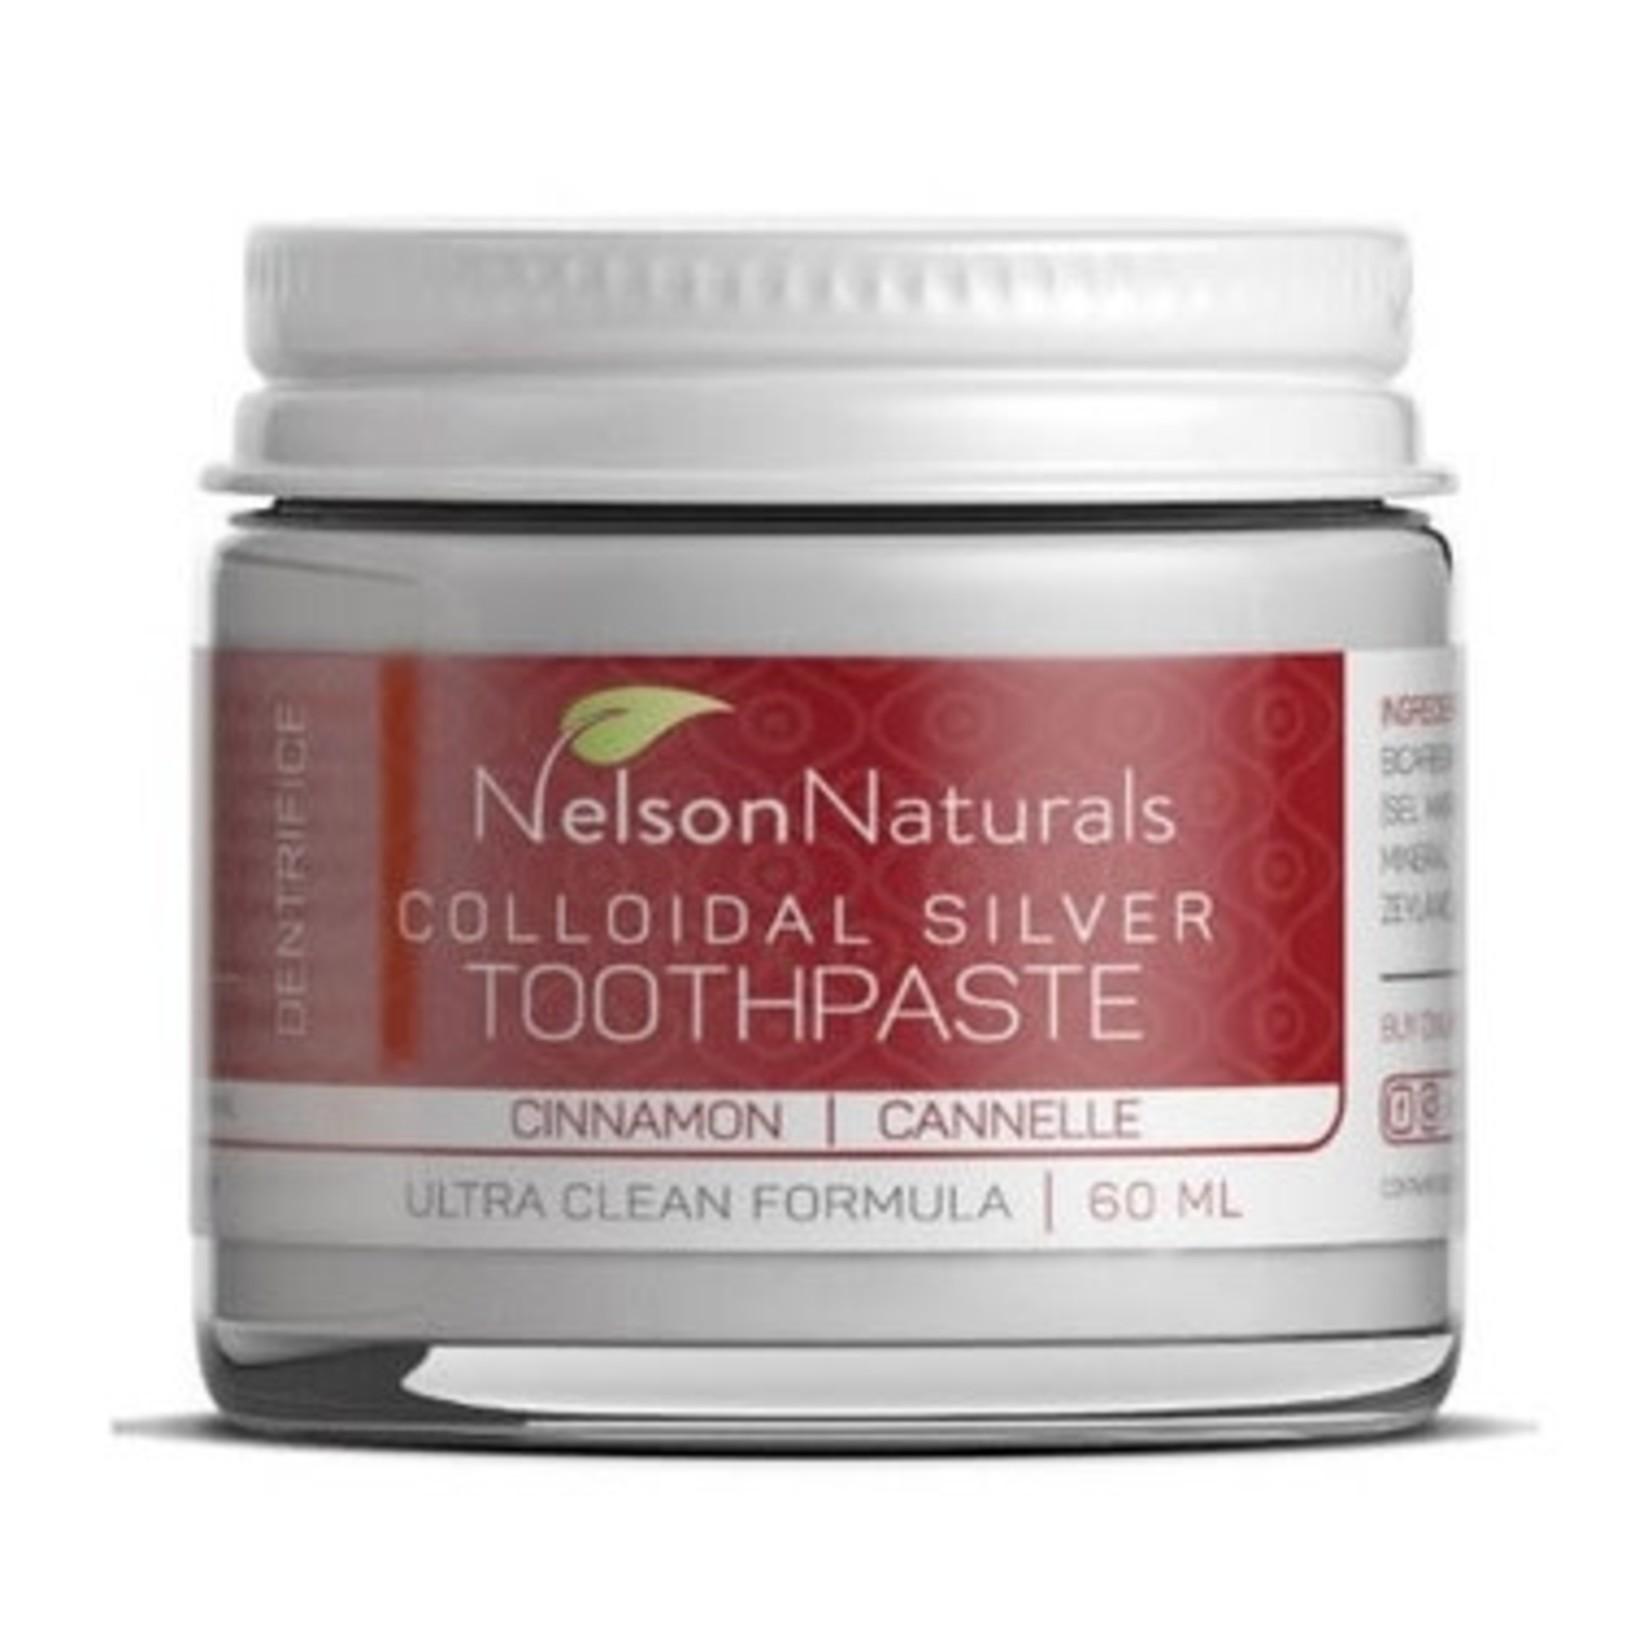 NELSON NATURALS Cinnamon Toothpaste